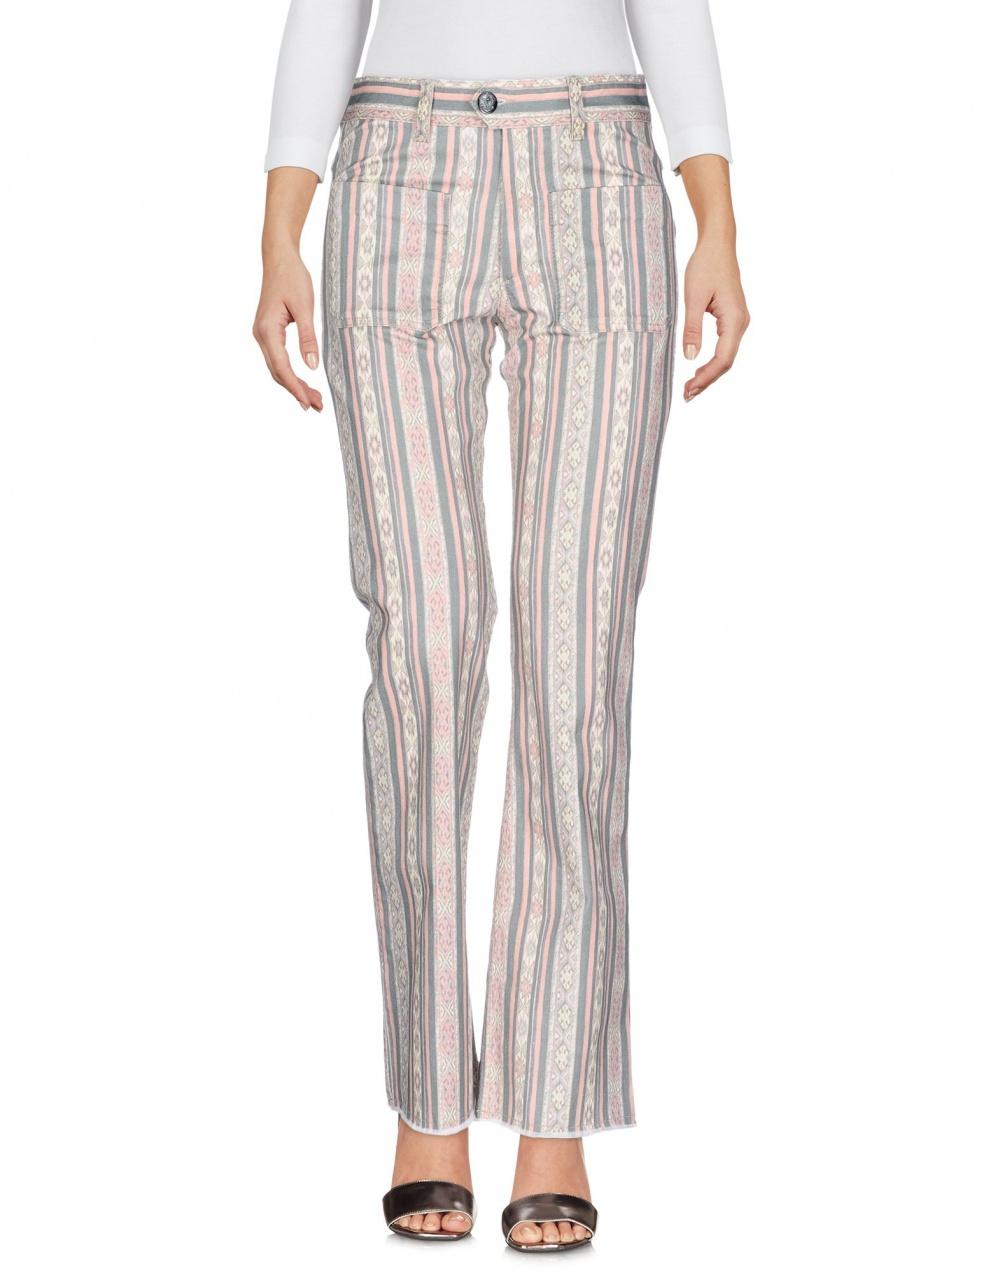 Isabel Marant Etoile джинсы EU40 (на 44-46 российский размер).